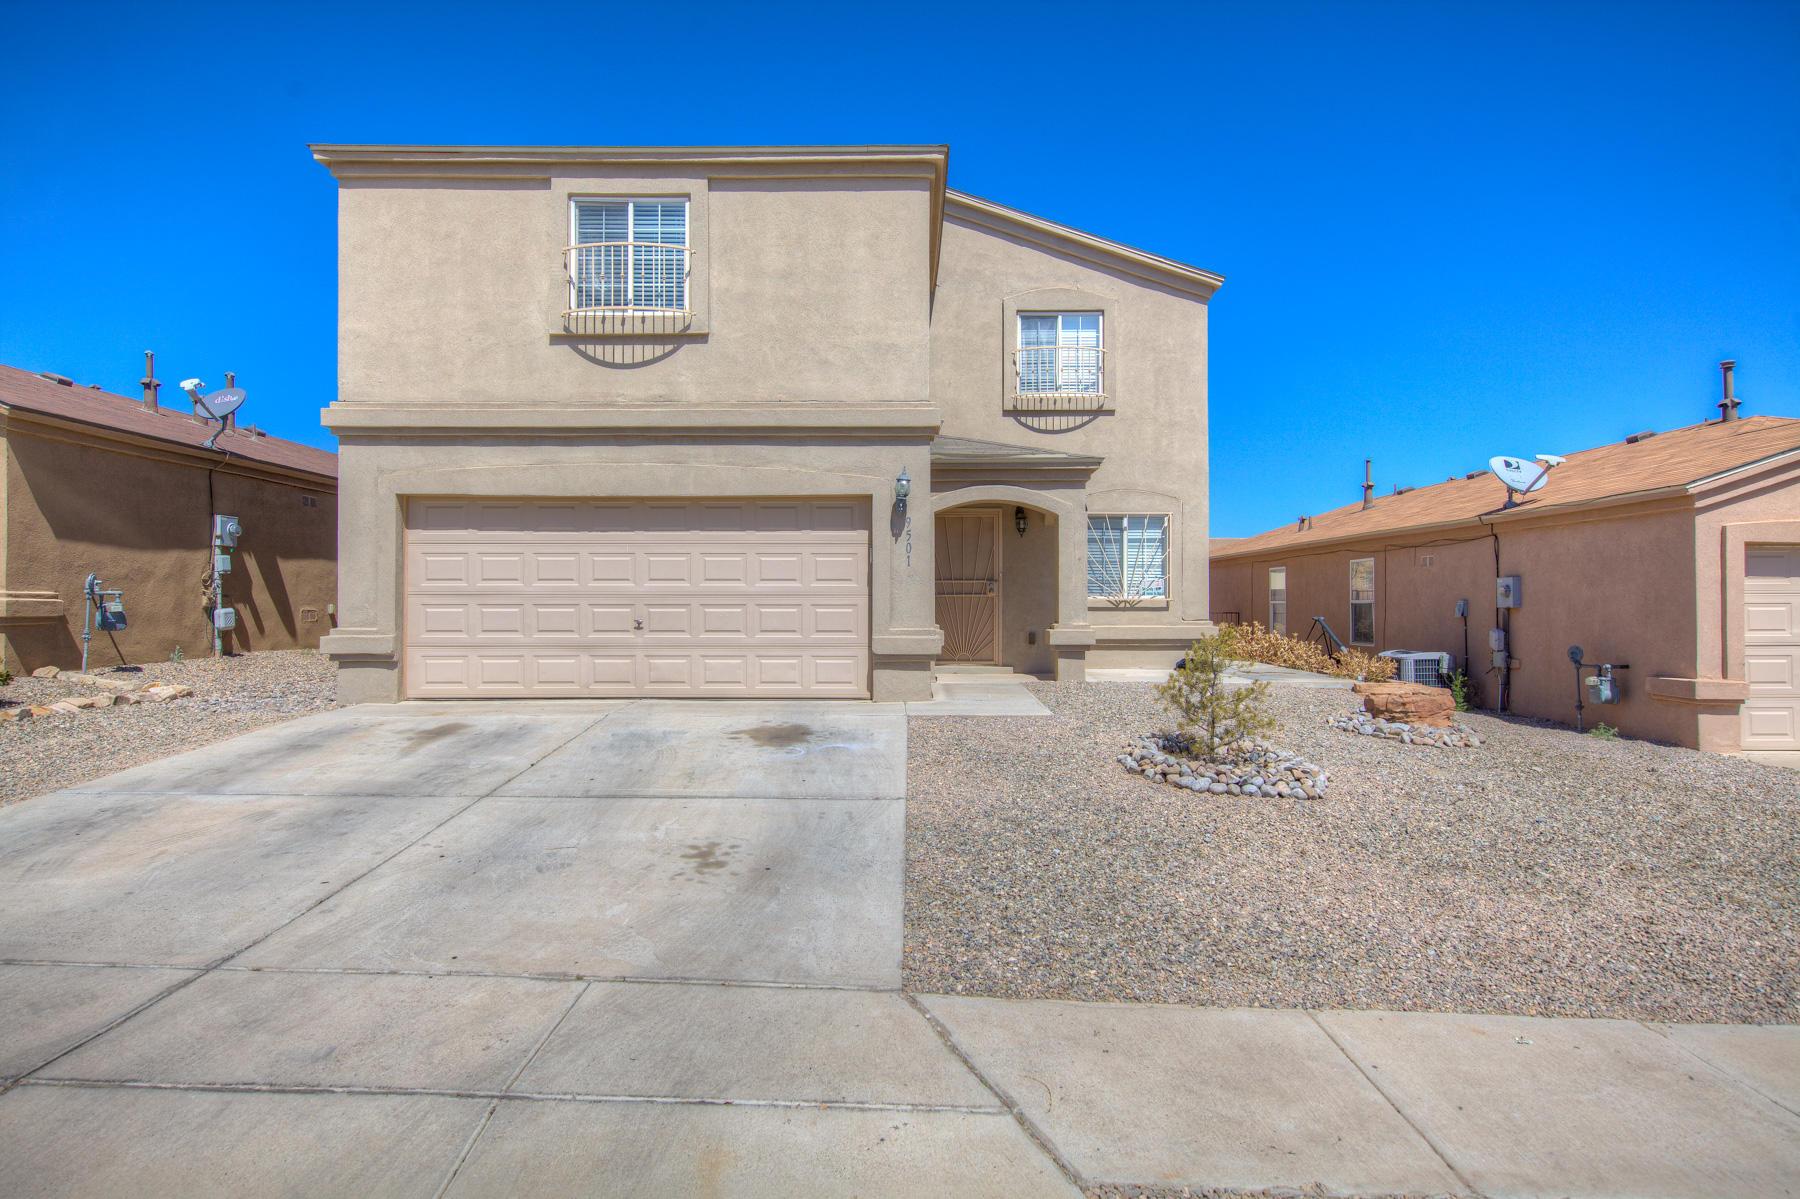 9501 VALLE CALDERA Road SW Property Photo - Albuquerque, NM real estate listing